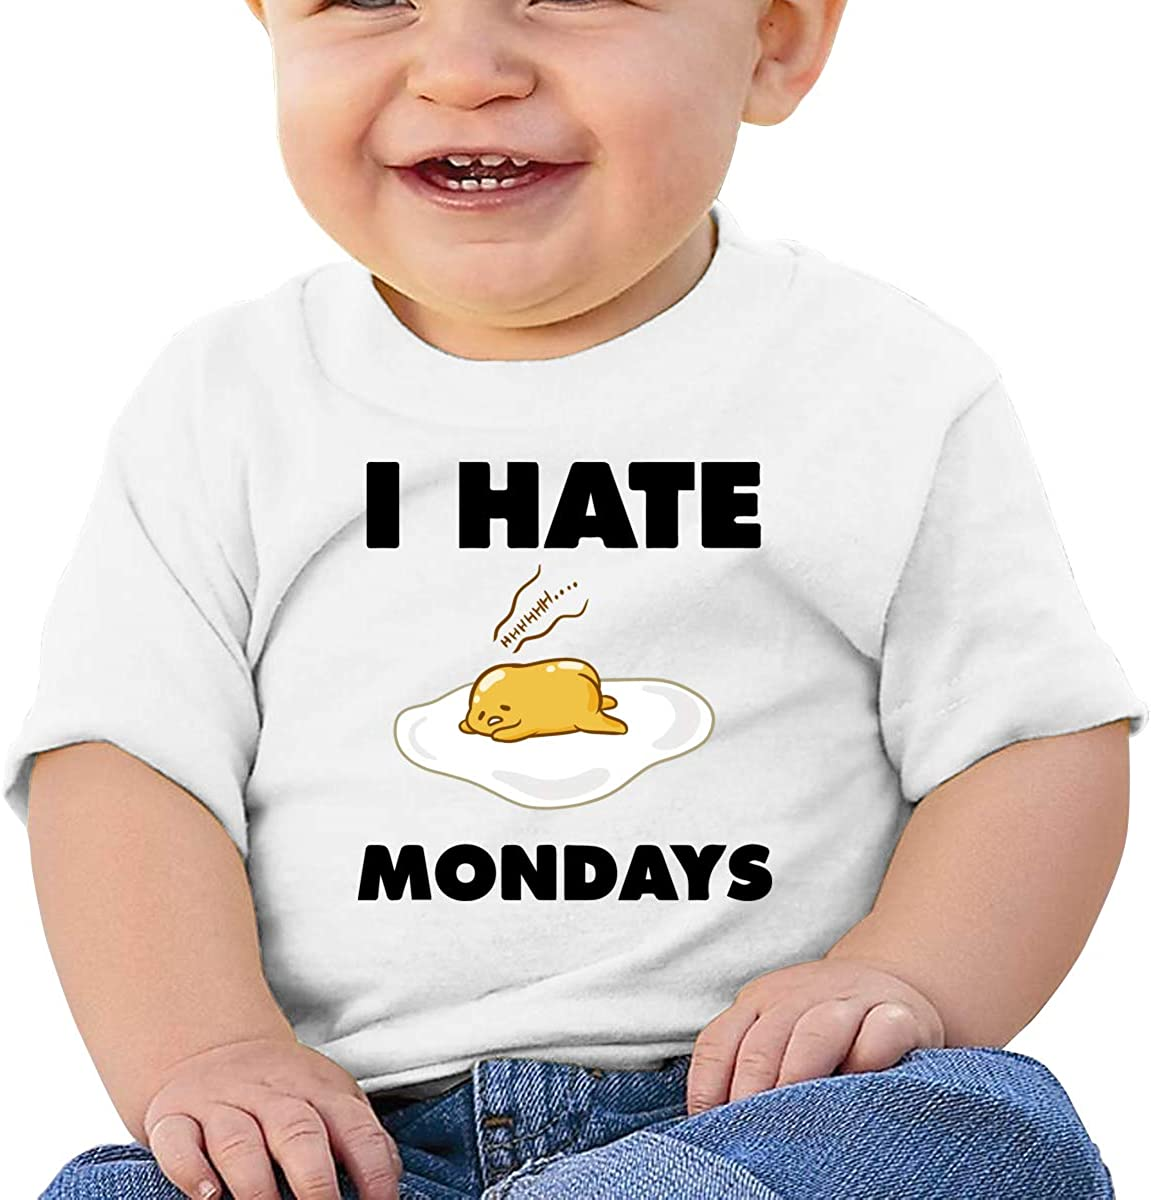 Kangtians Baby I Hate Mondays Lazy Egg Short Sleeve Shirt Toddler Tee